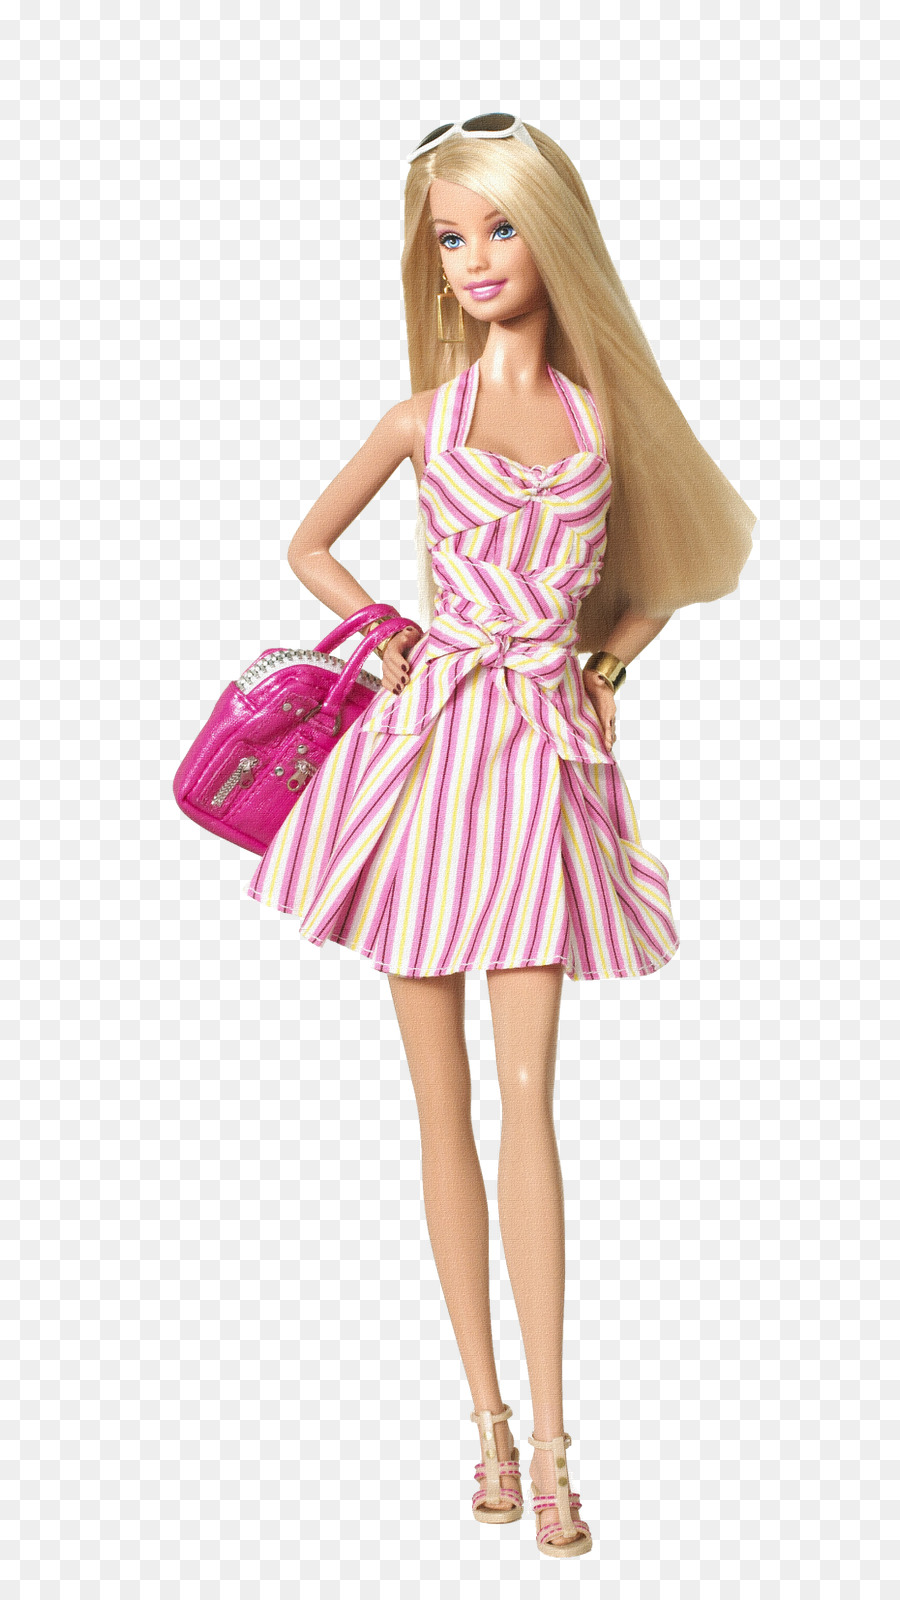 Dolls clipart clothes barbie. Cartoon doll clothing transparent